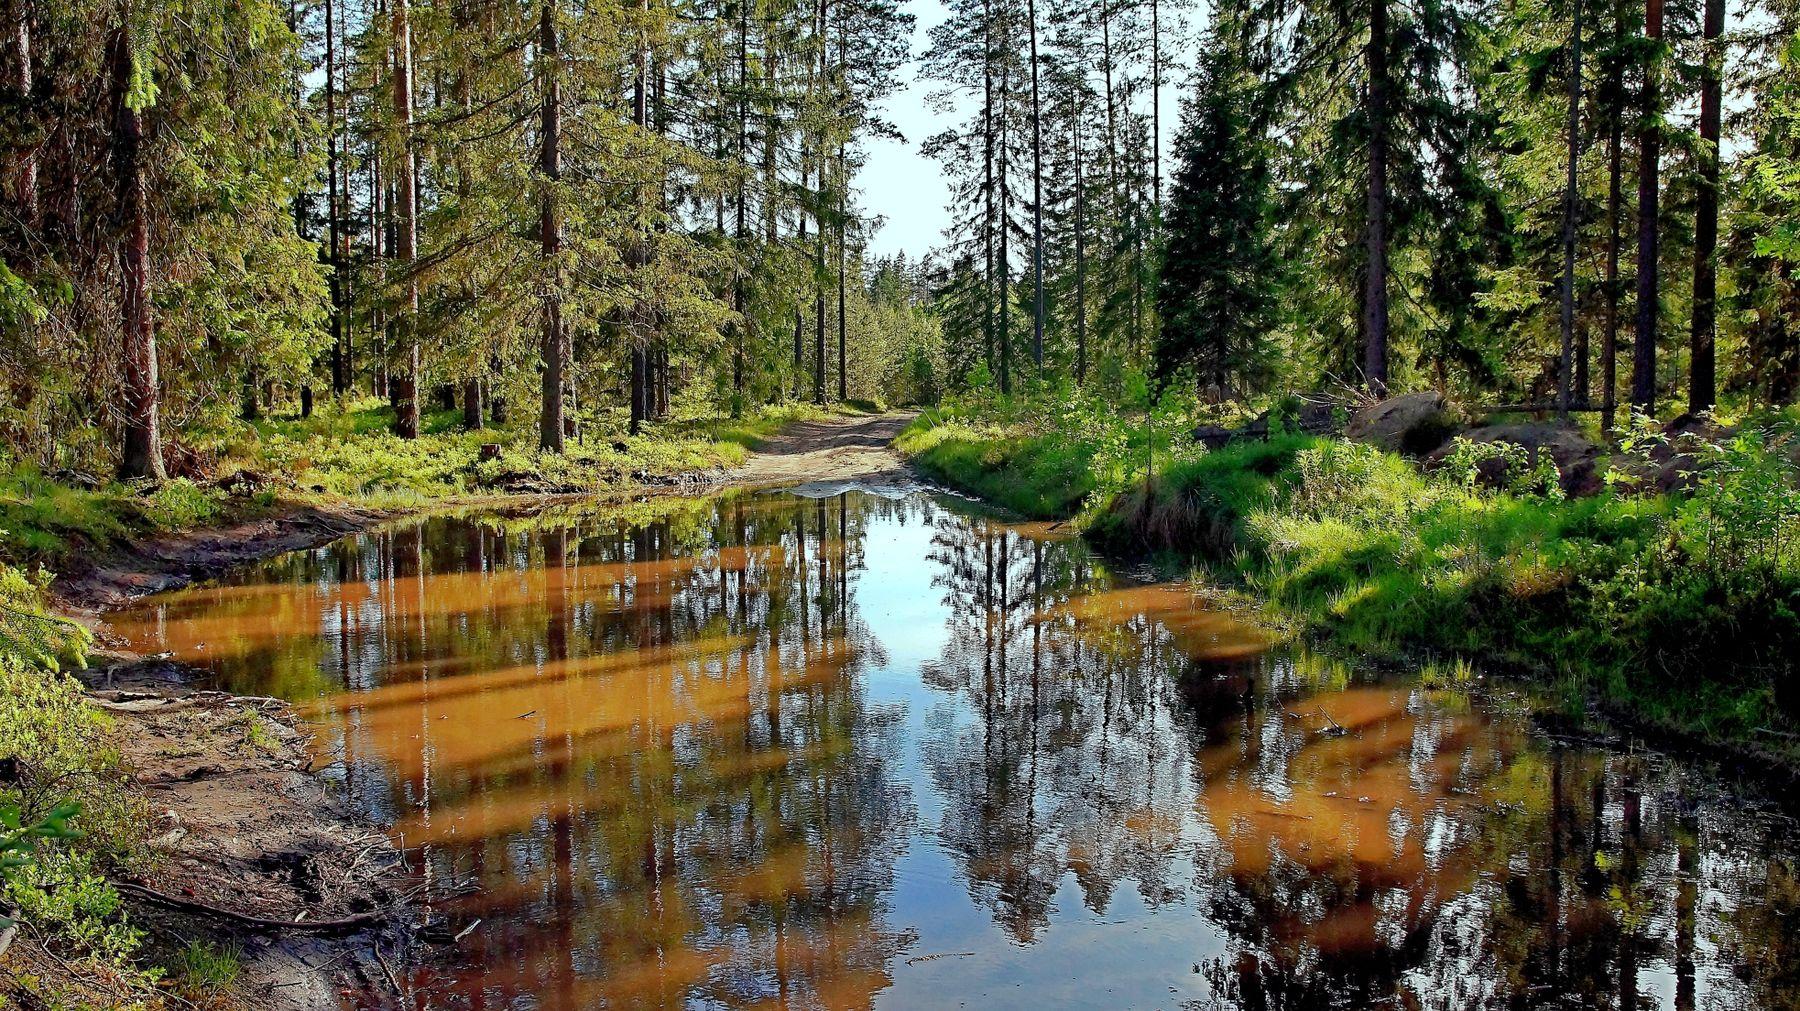 Лесные дороги Лето лес дорога вечер